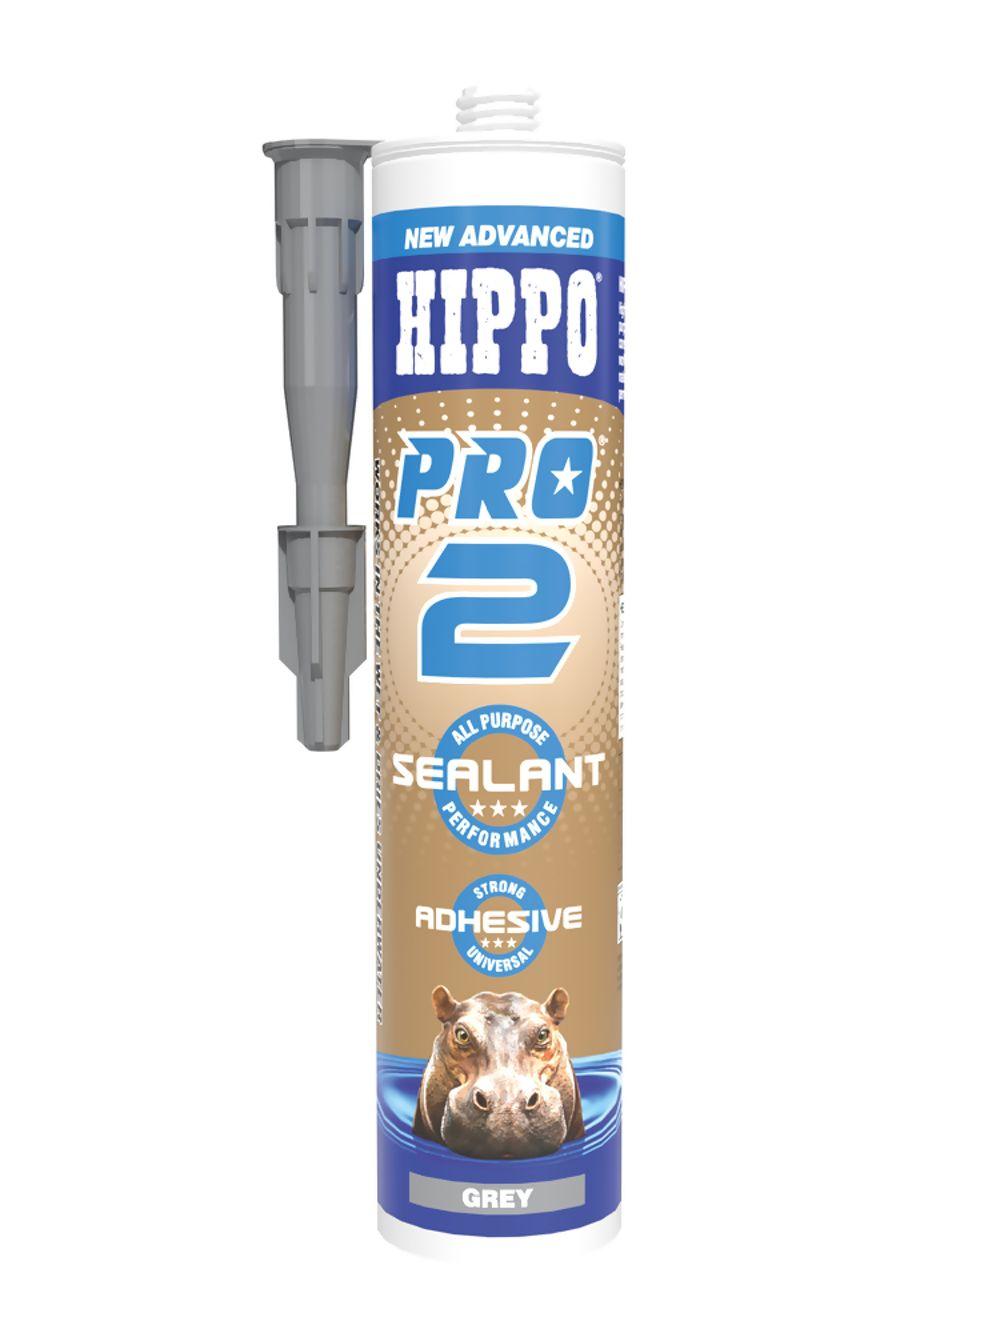 Hippo Pro 2 Sealant & Adhesive Grey 310ml Ref H18542